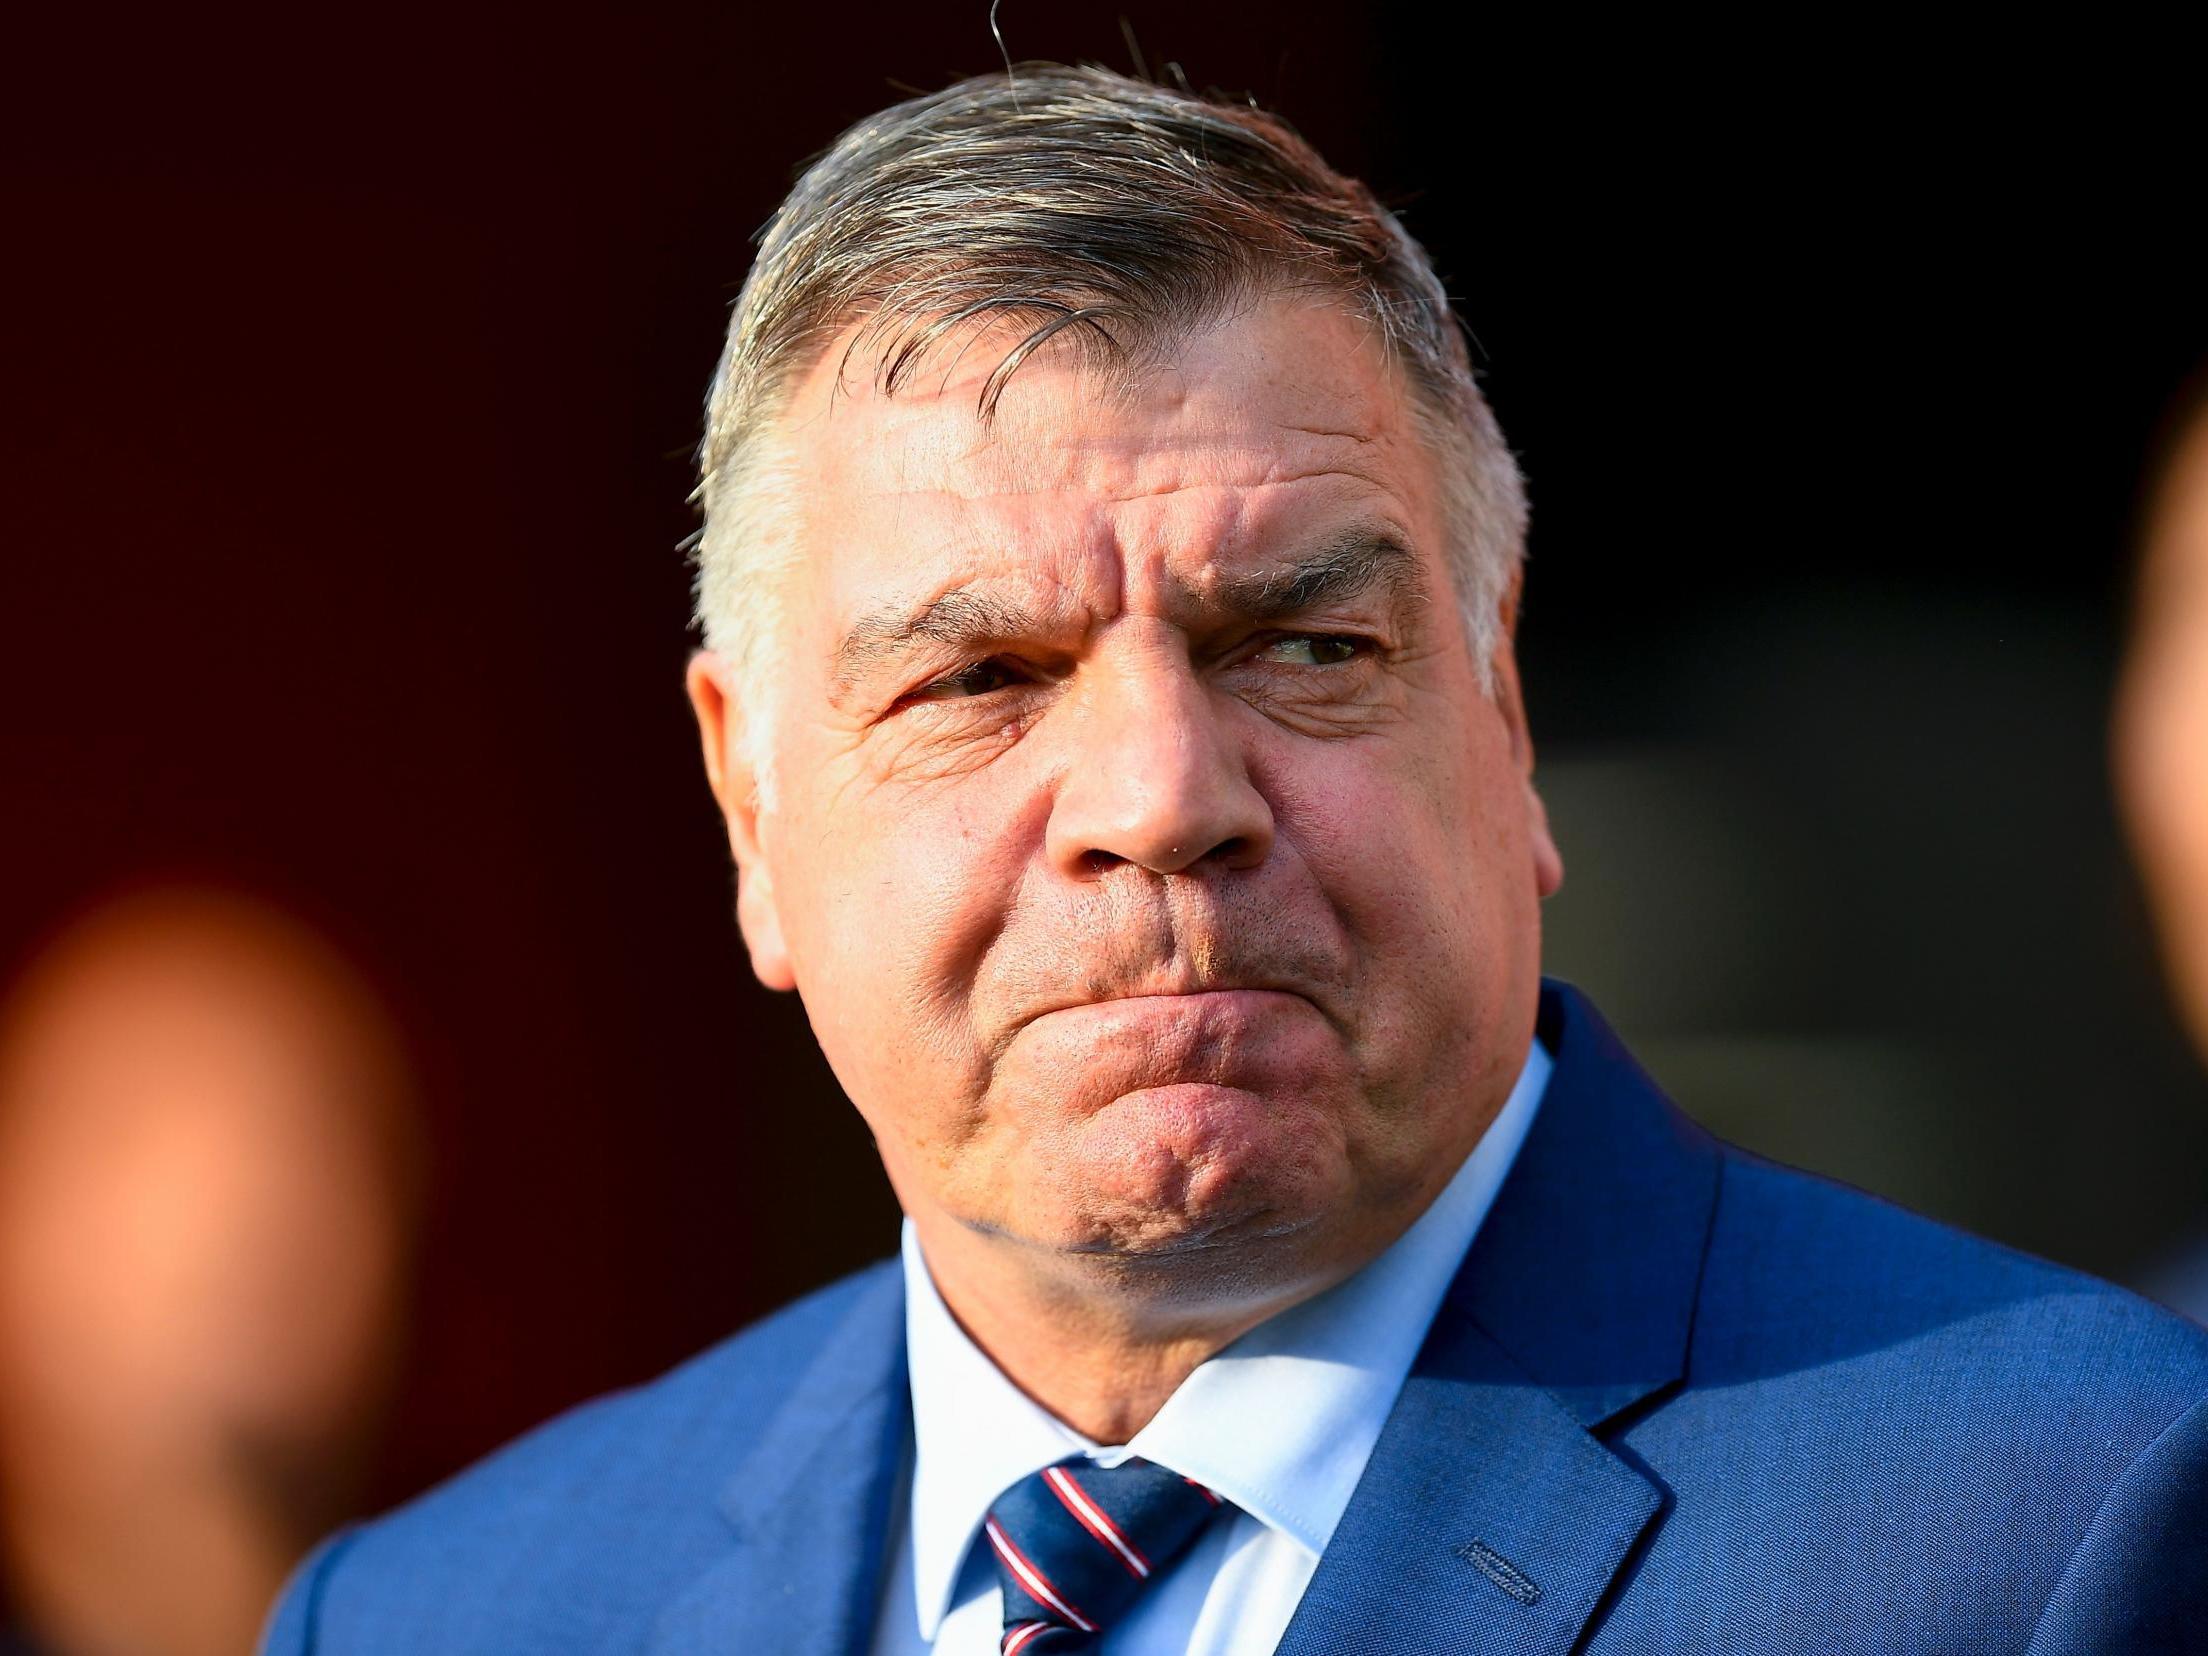 Next Newcastle manager: Sam Allardyce says he has turned down chance to replace Rafa Benitez